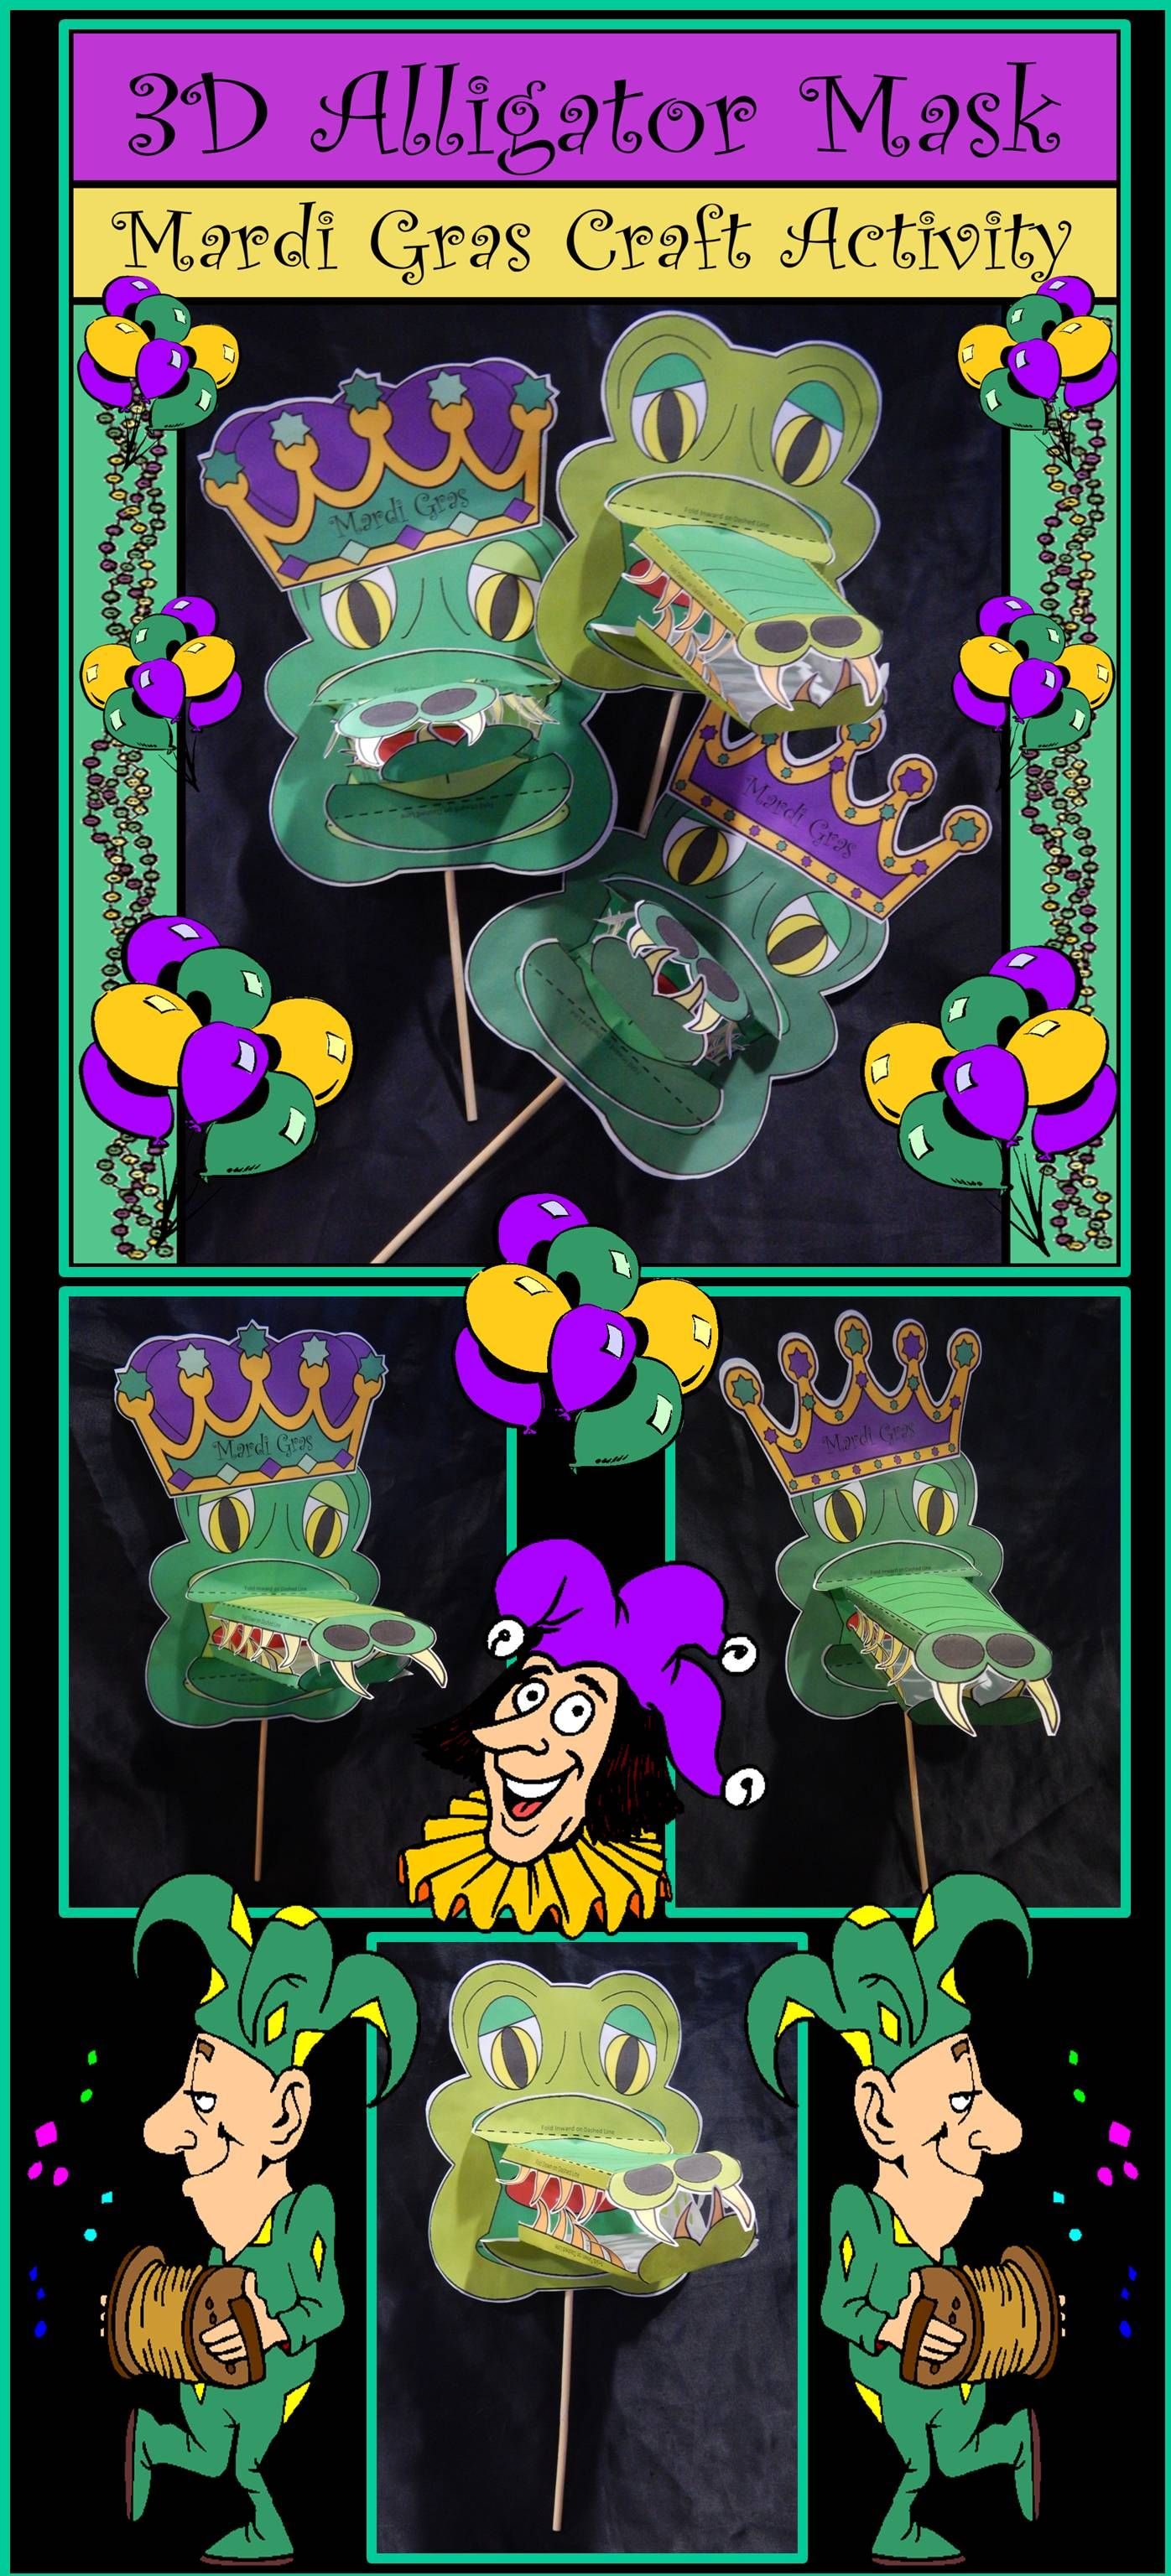 Mardi Gras Craft Activities 3d Alligator Mask Craft